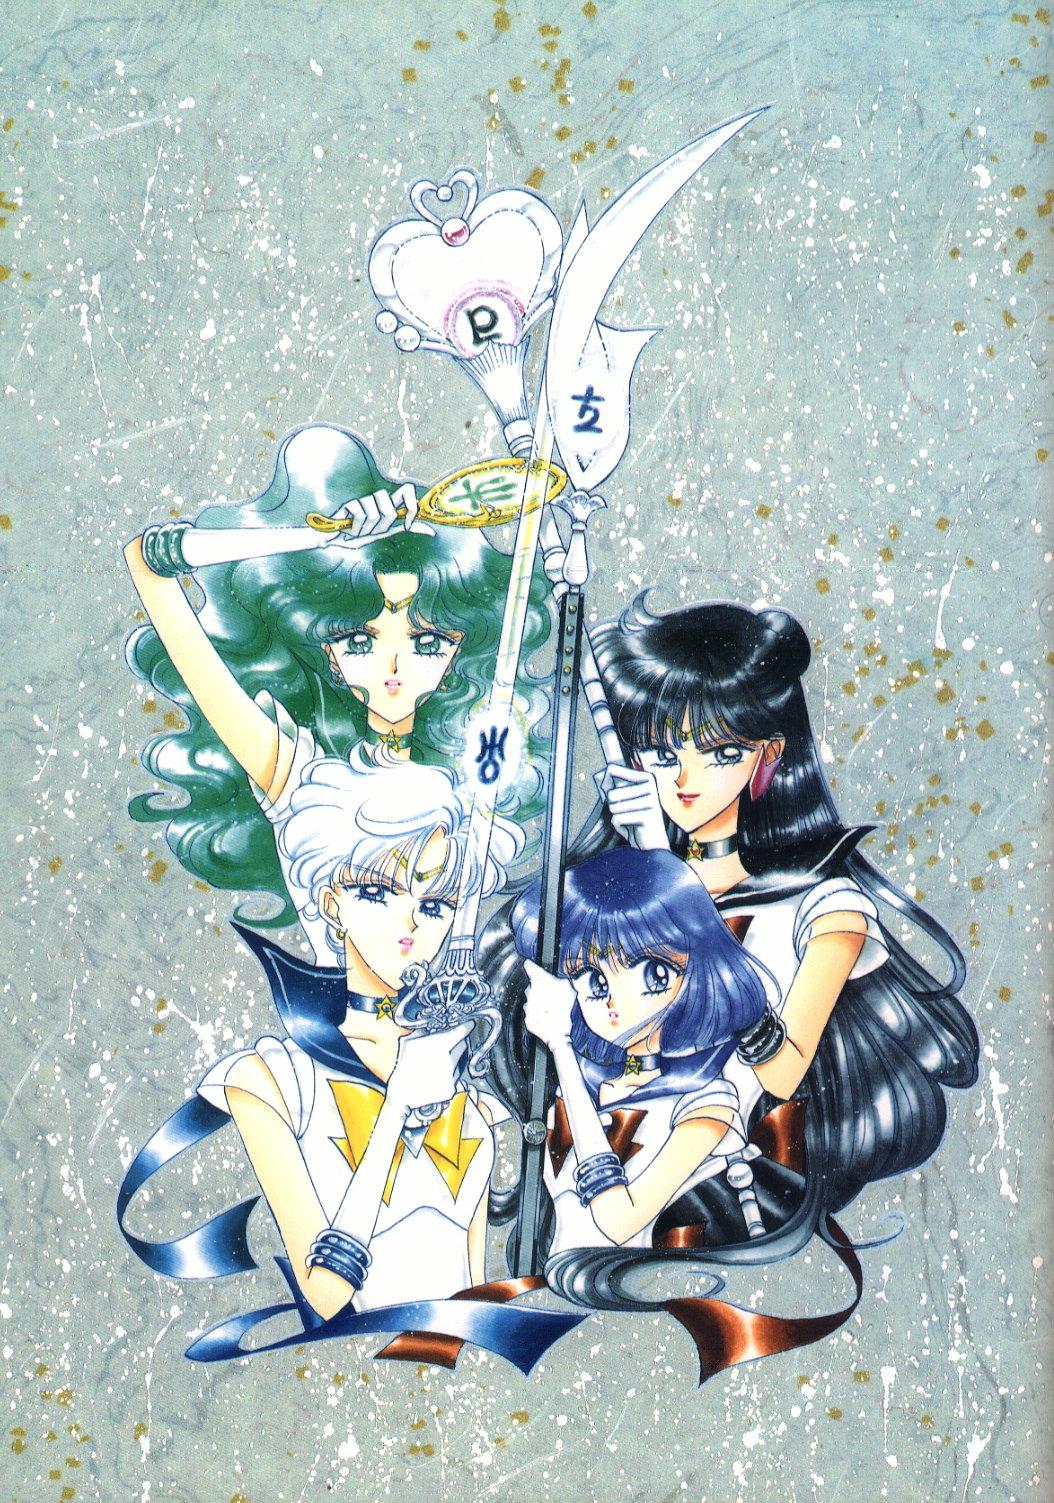 Outer senshi bishoujo senshi sailor moon mobile wallpaper tags anime takeuchi naoko bishoujo senshi sailor moon sailor uranus meiou biocorpaavc Images